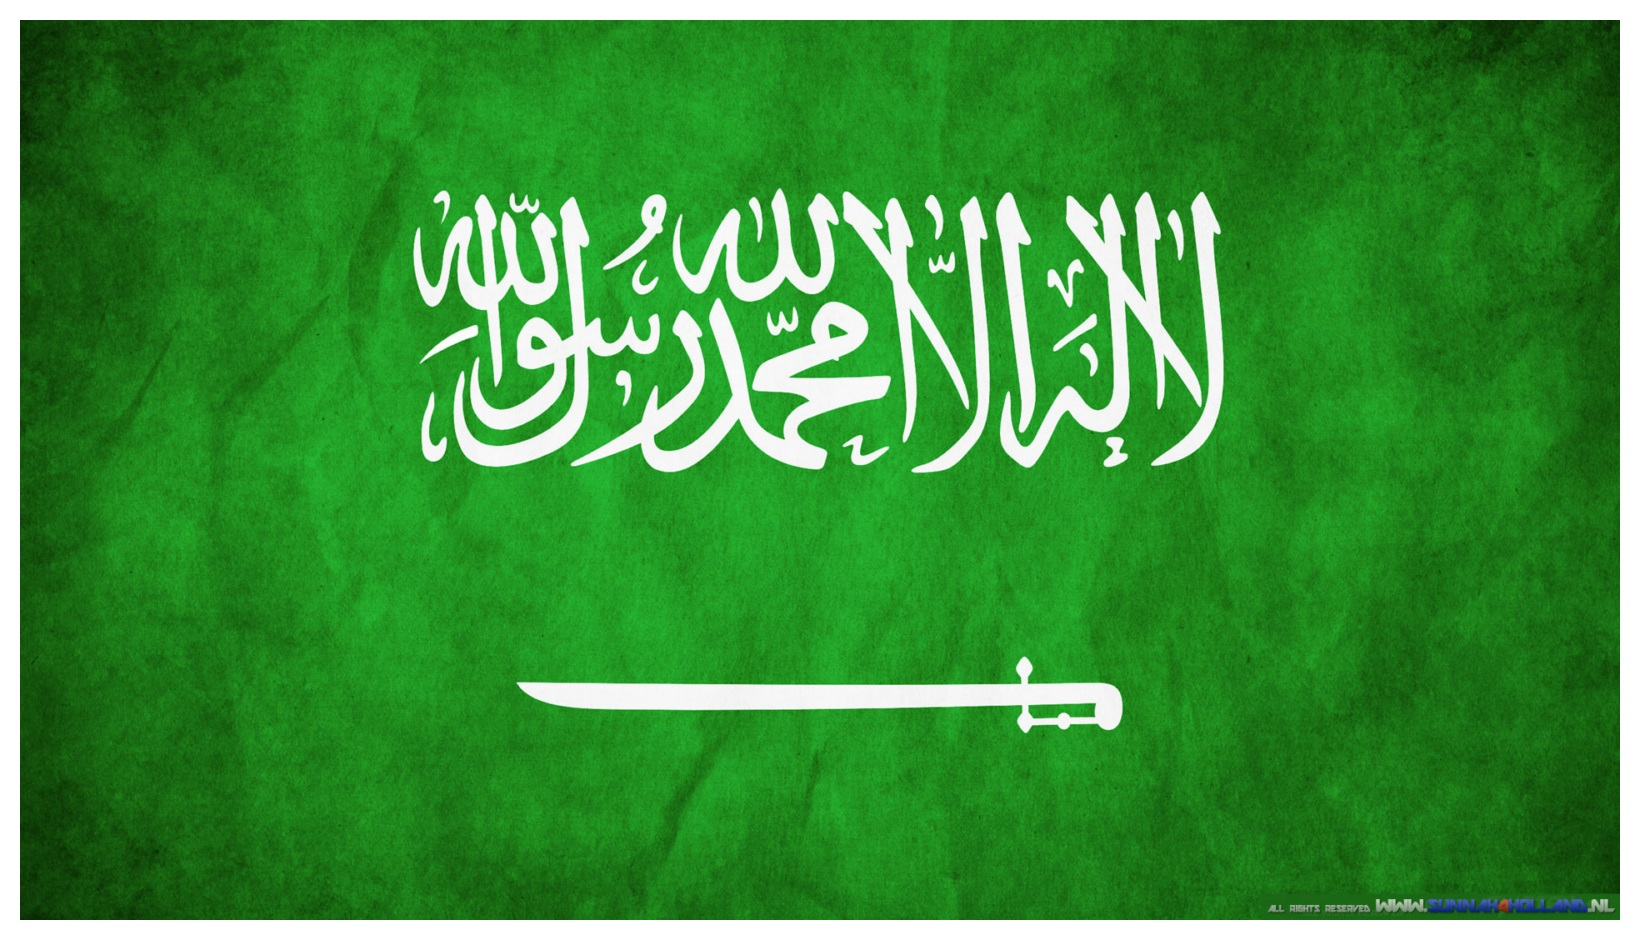 Round La ilaha illallah Muhammadur Rasulullah Wallpapers Design